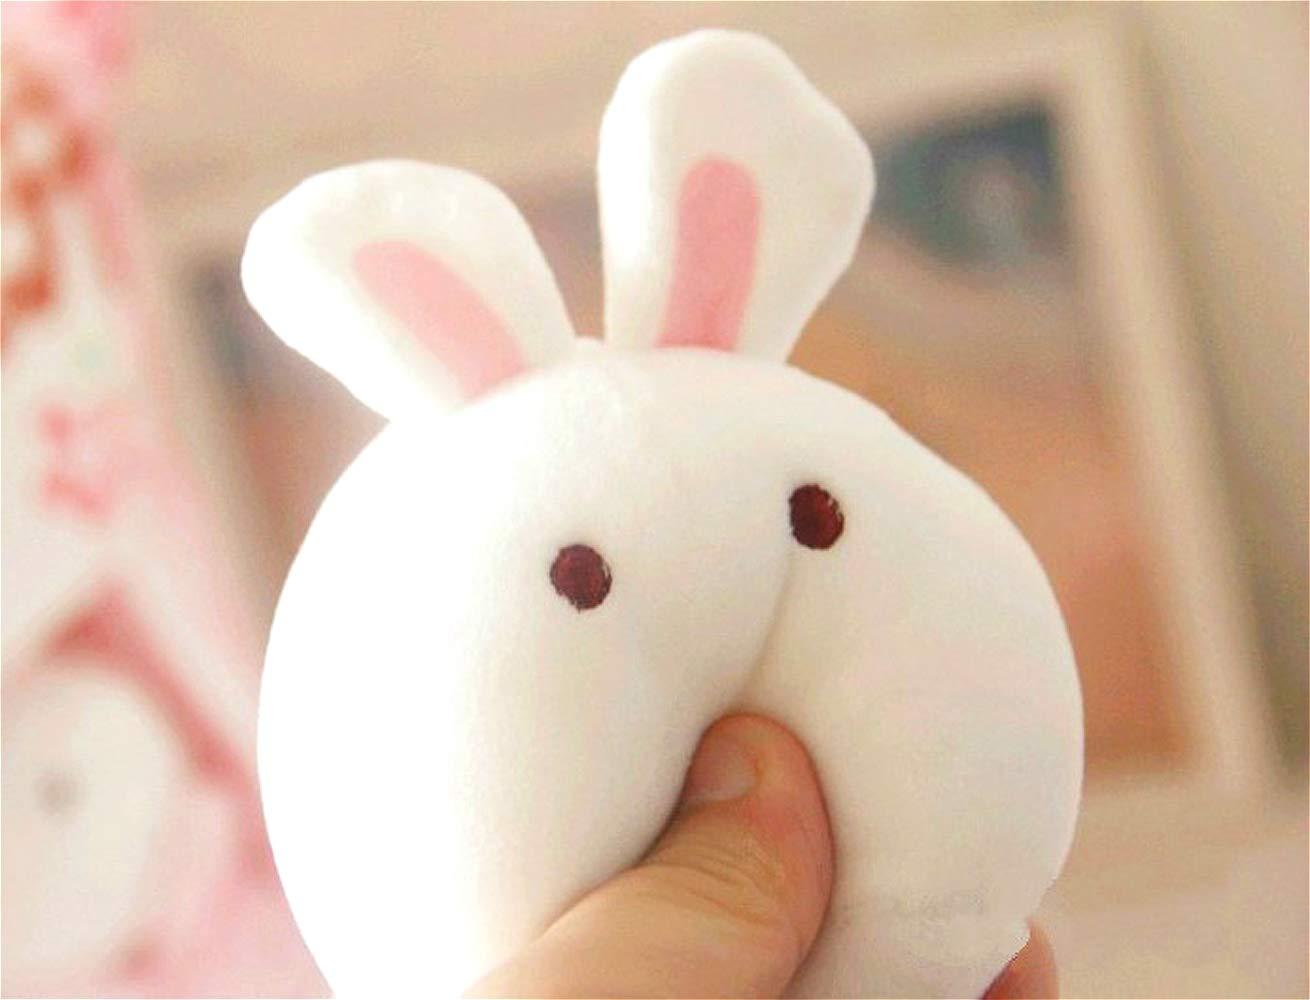 Nenalayo Cute Throw Pillow Stuffed Animal Toys Removable Fluffy Bunnies Creative Gifts for Teens Girls Kids by Nenalayo (Image #6)